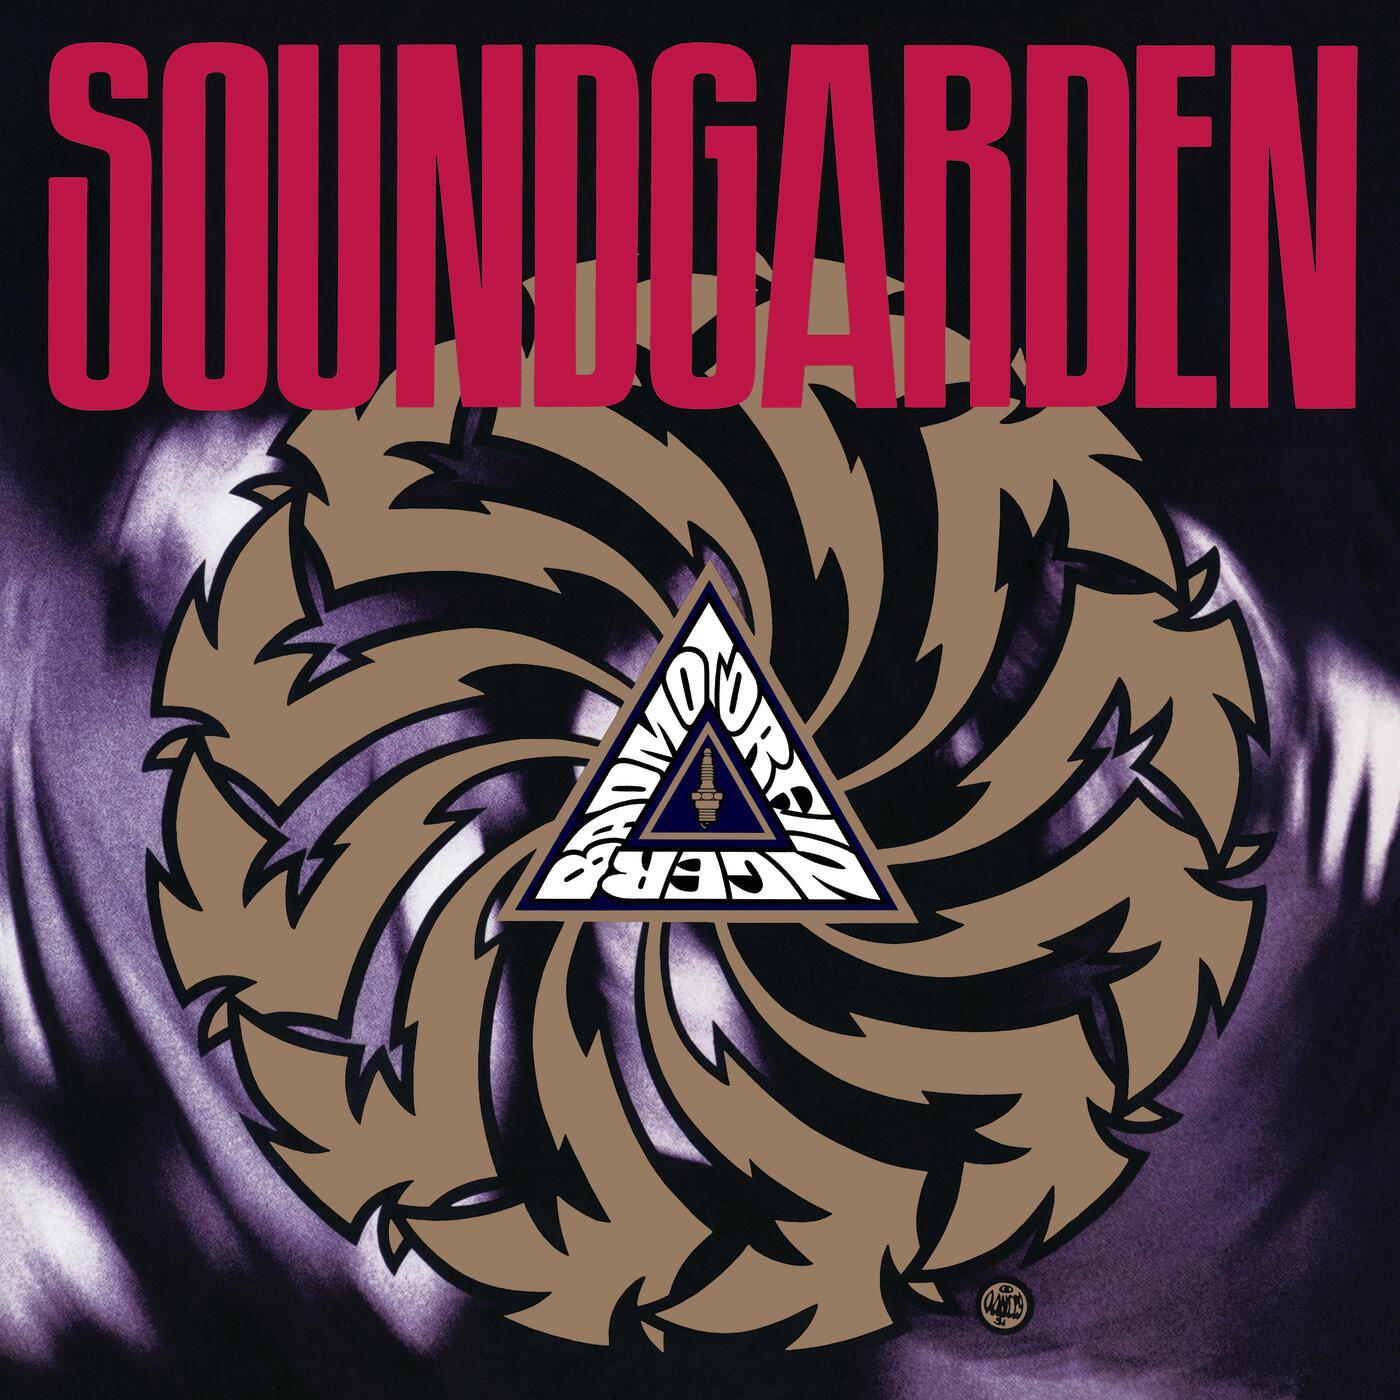 Listen Free to Soundgarden - Badmotorfinger Radio on ...